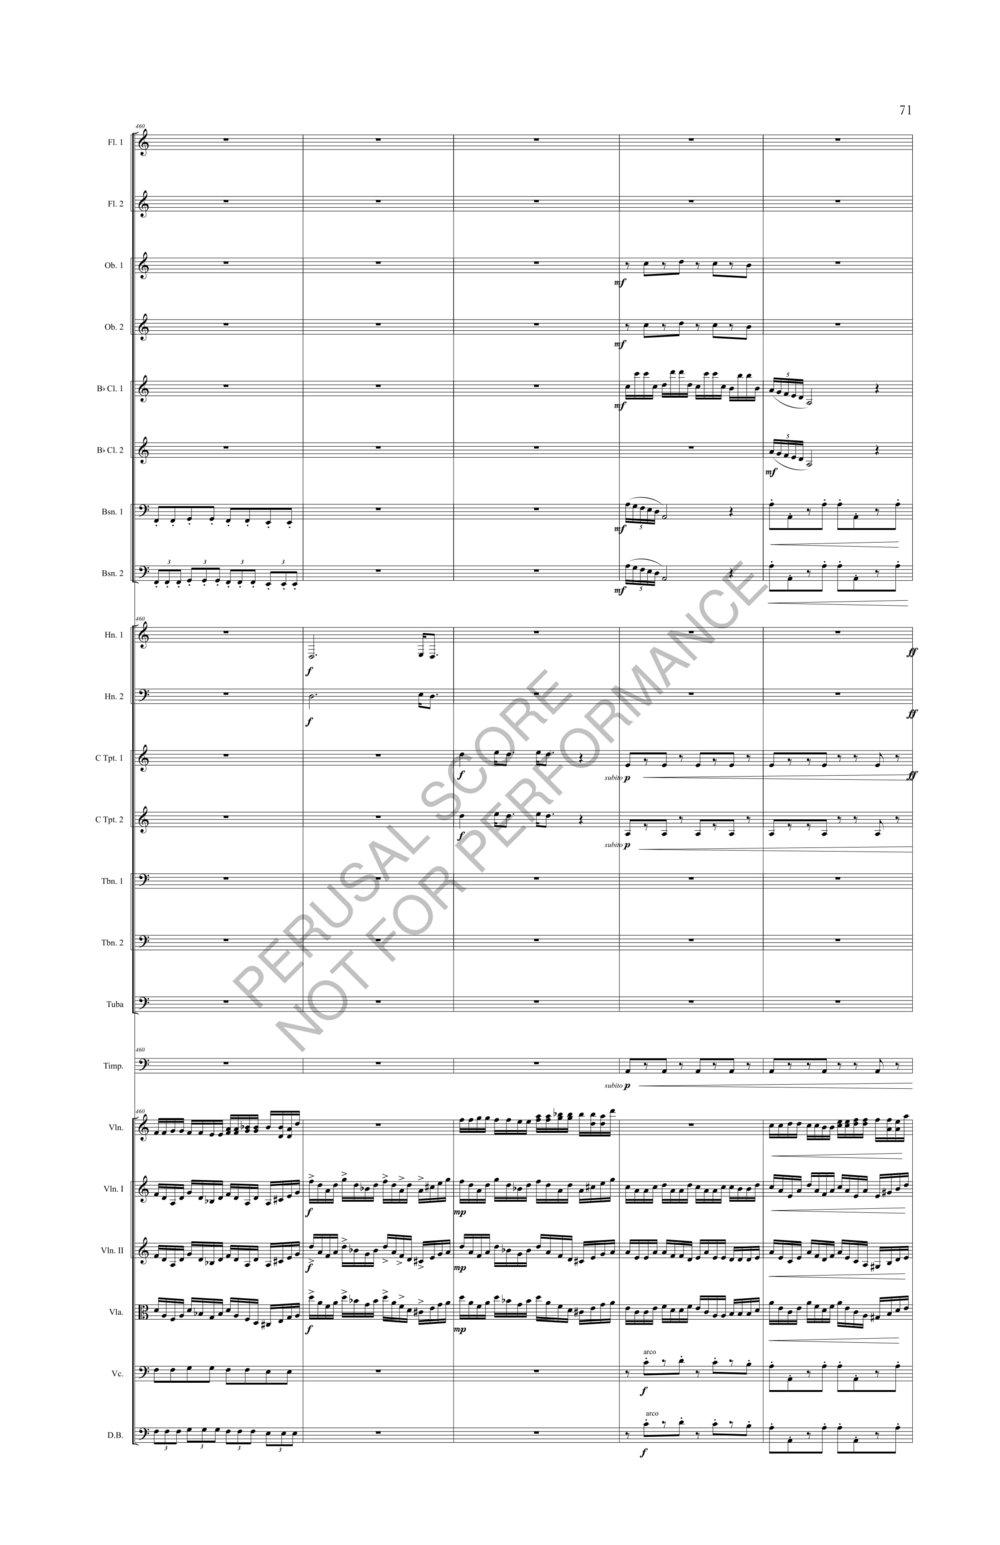 Boyd Sybil Score-watermark (1)-149.jpg